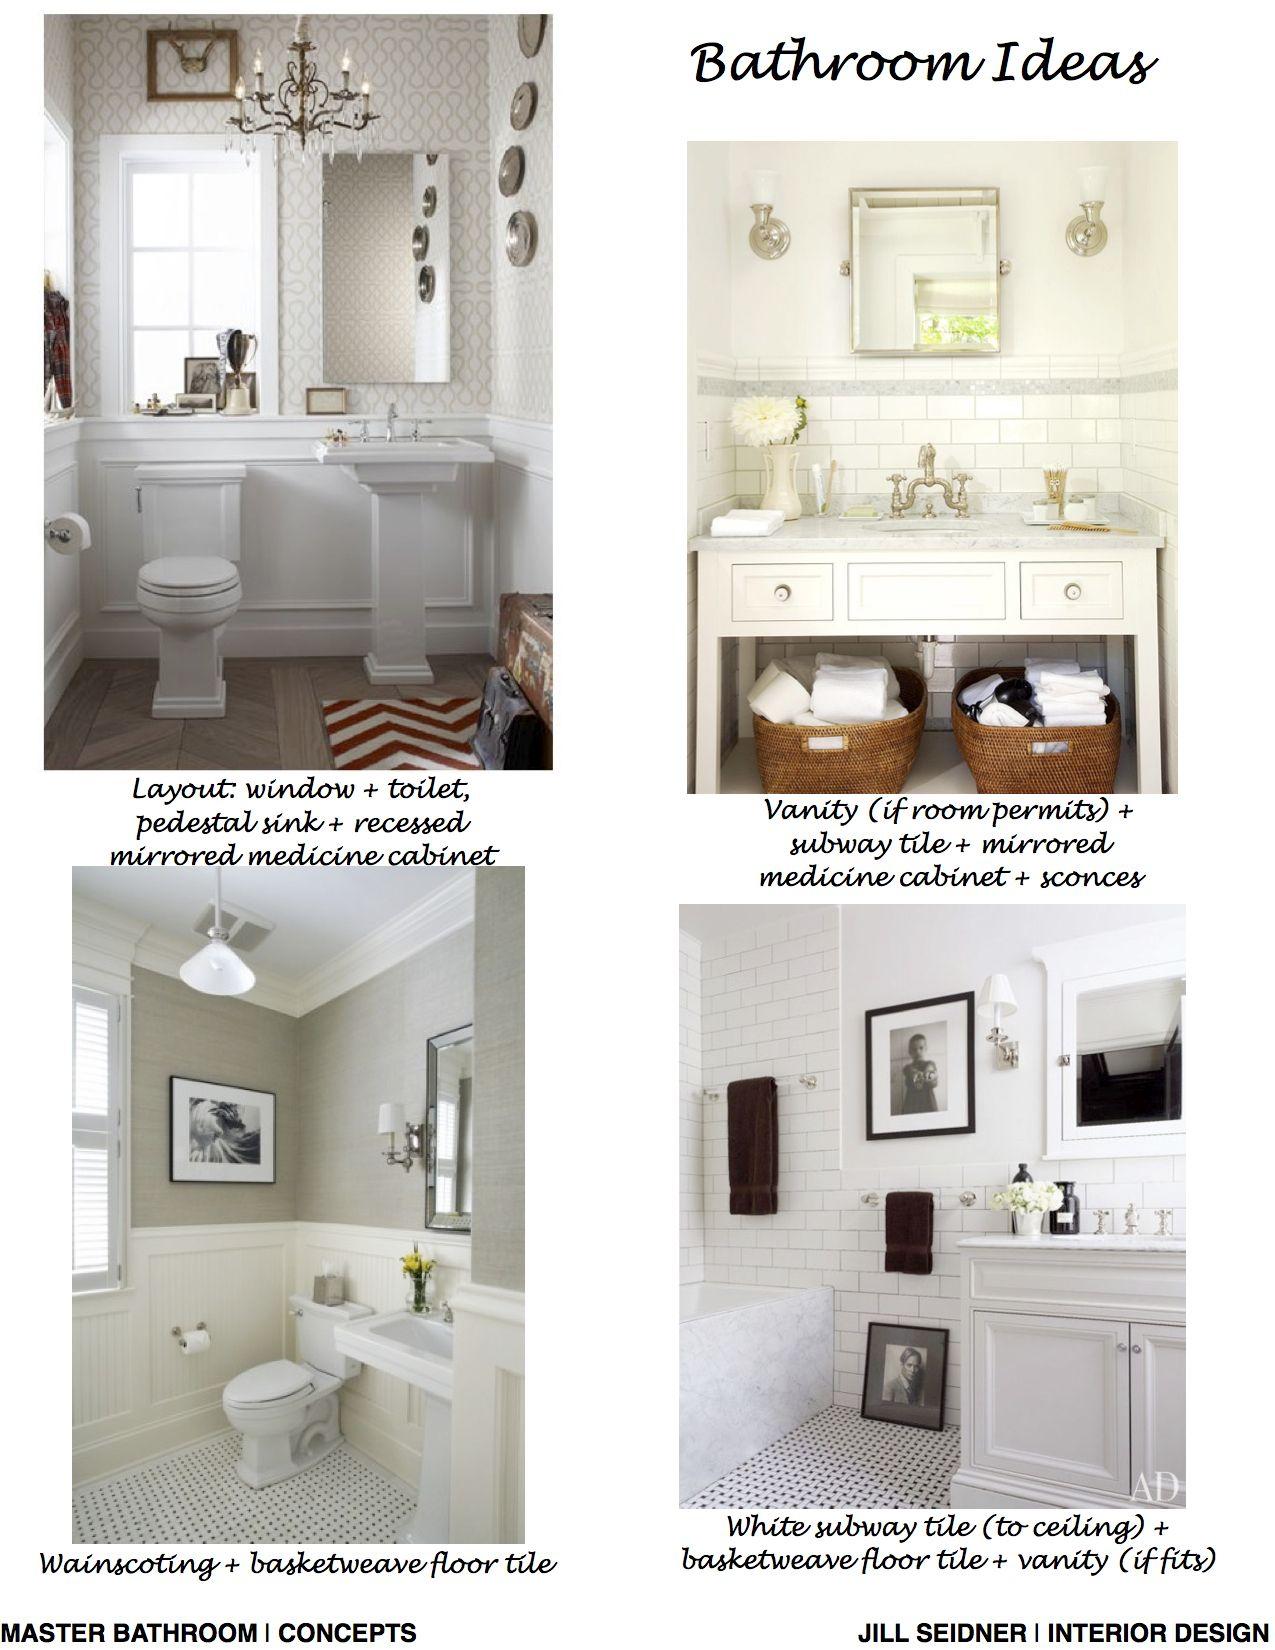 Los Angeles Craftsman House Residence, Master Bathroom Ideas Concept ...